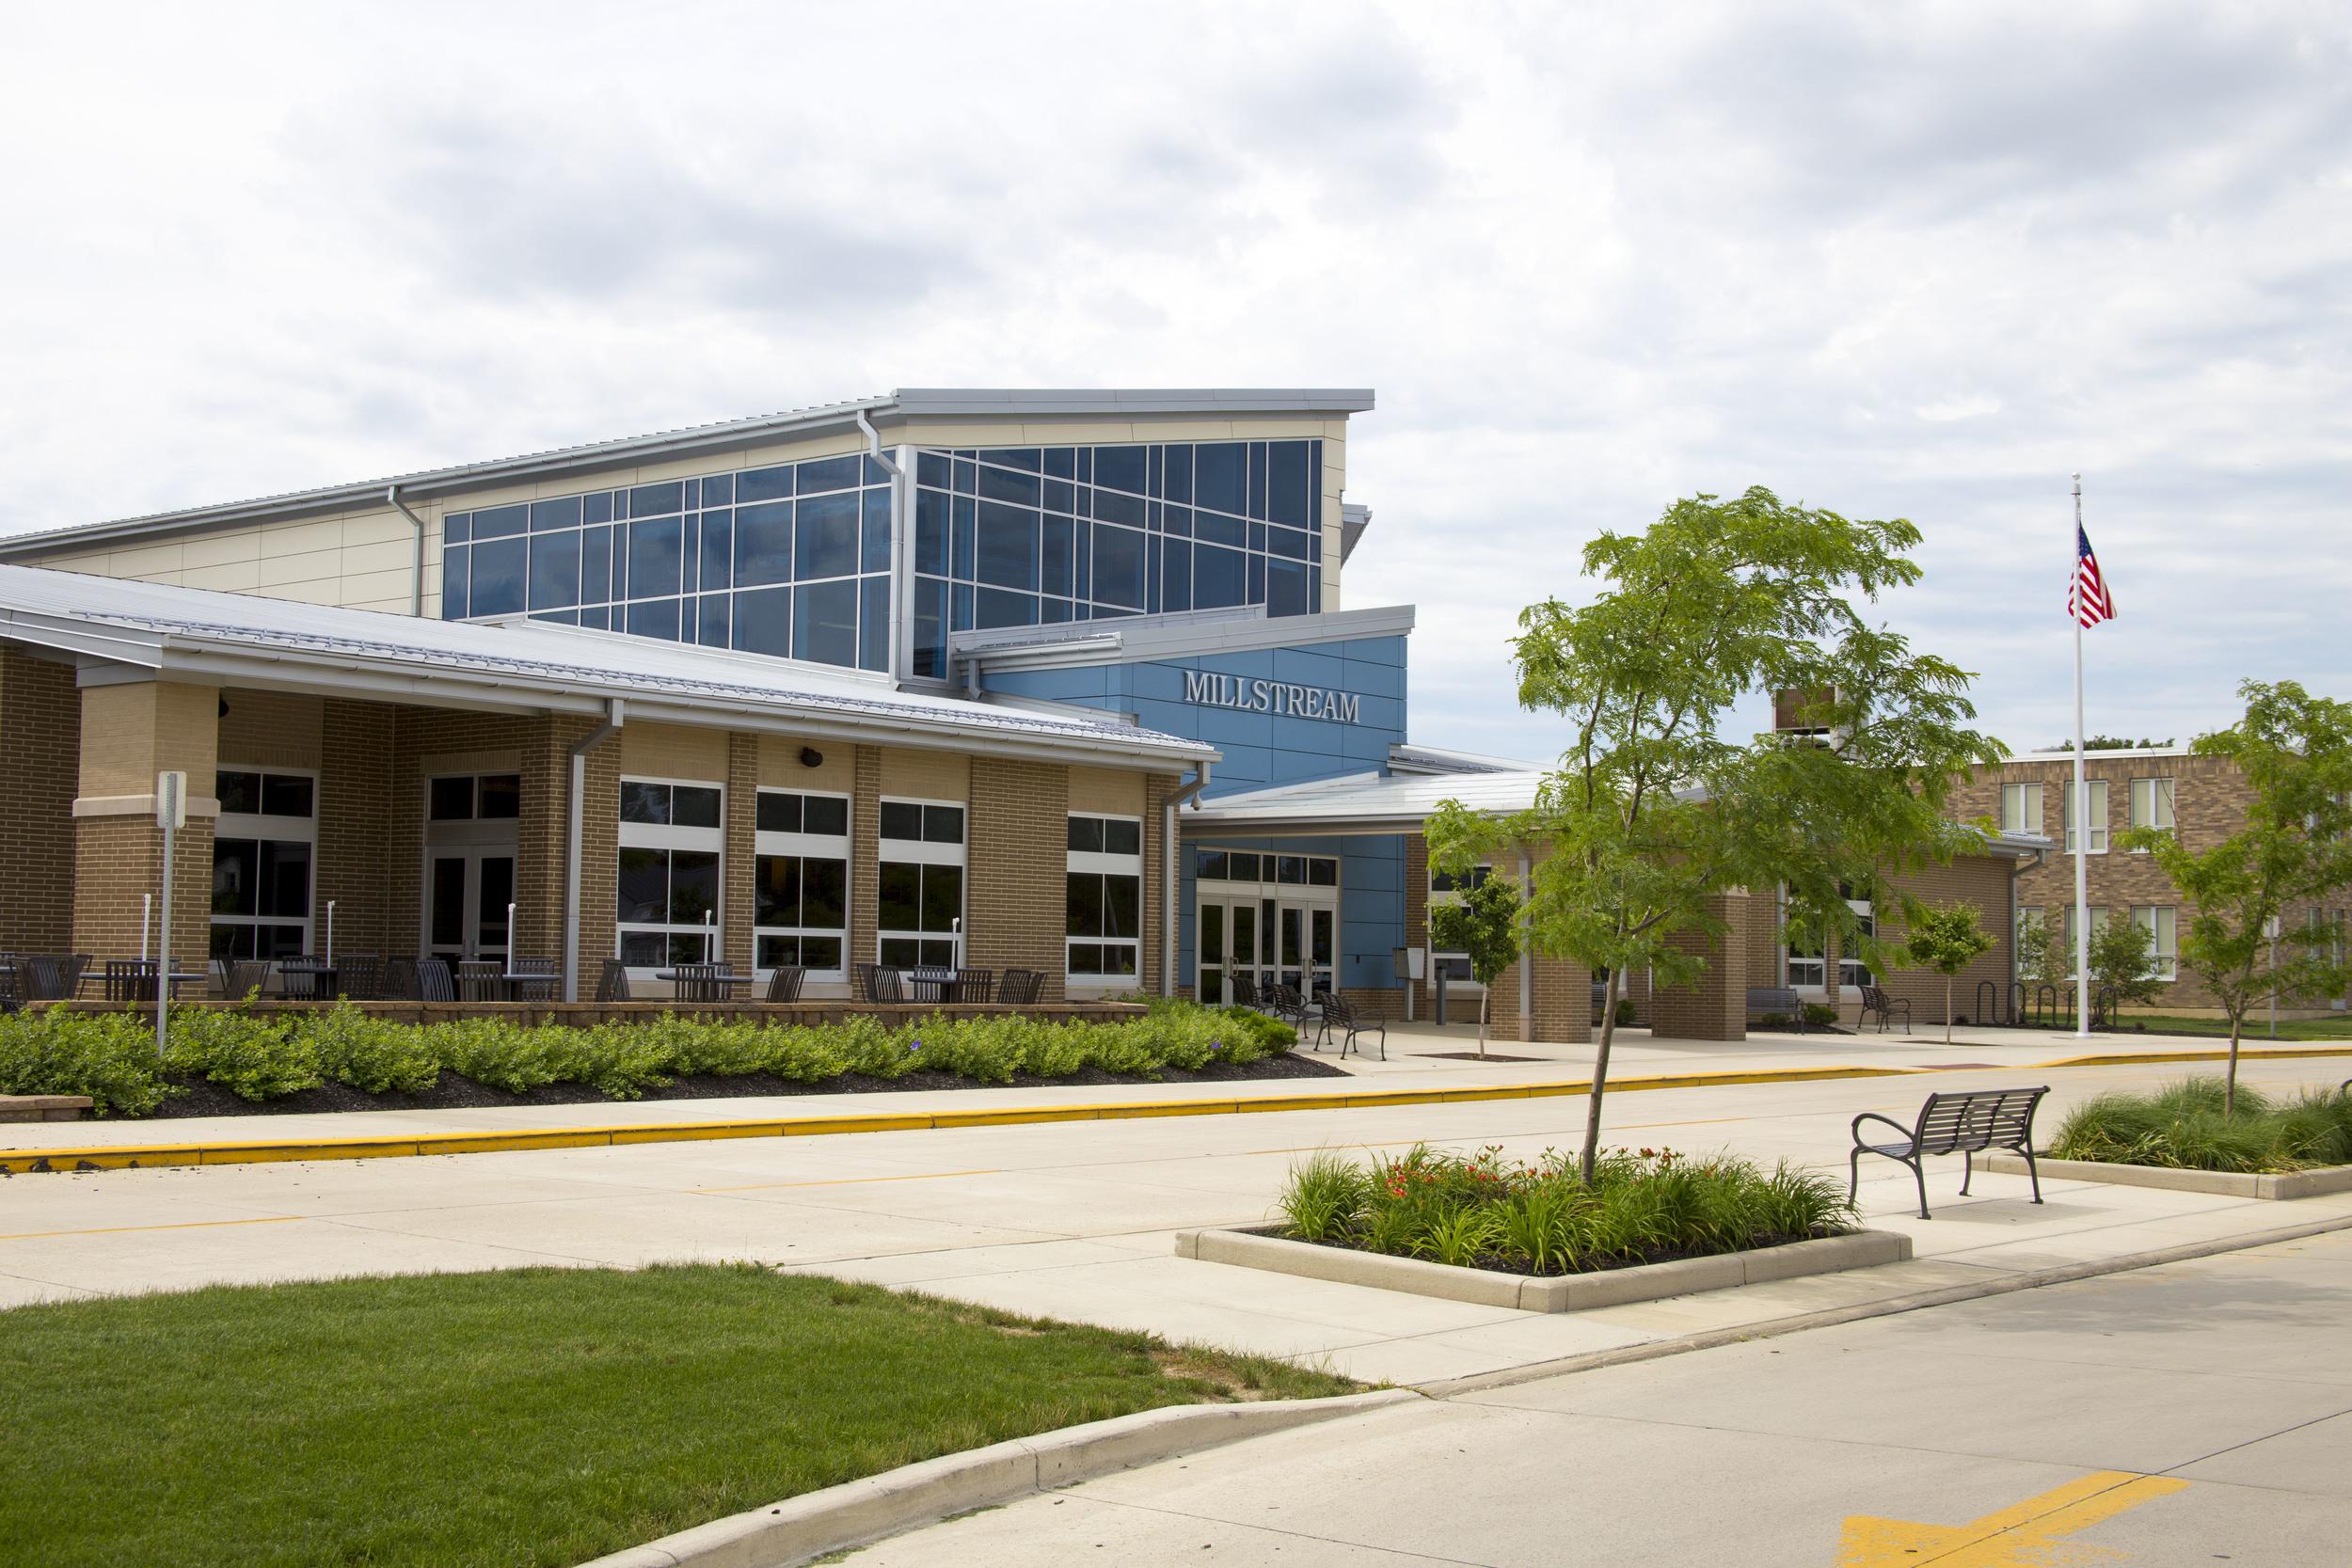 www.rcmarchitects.com - findlay city schools: millstream career center (1)